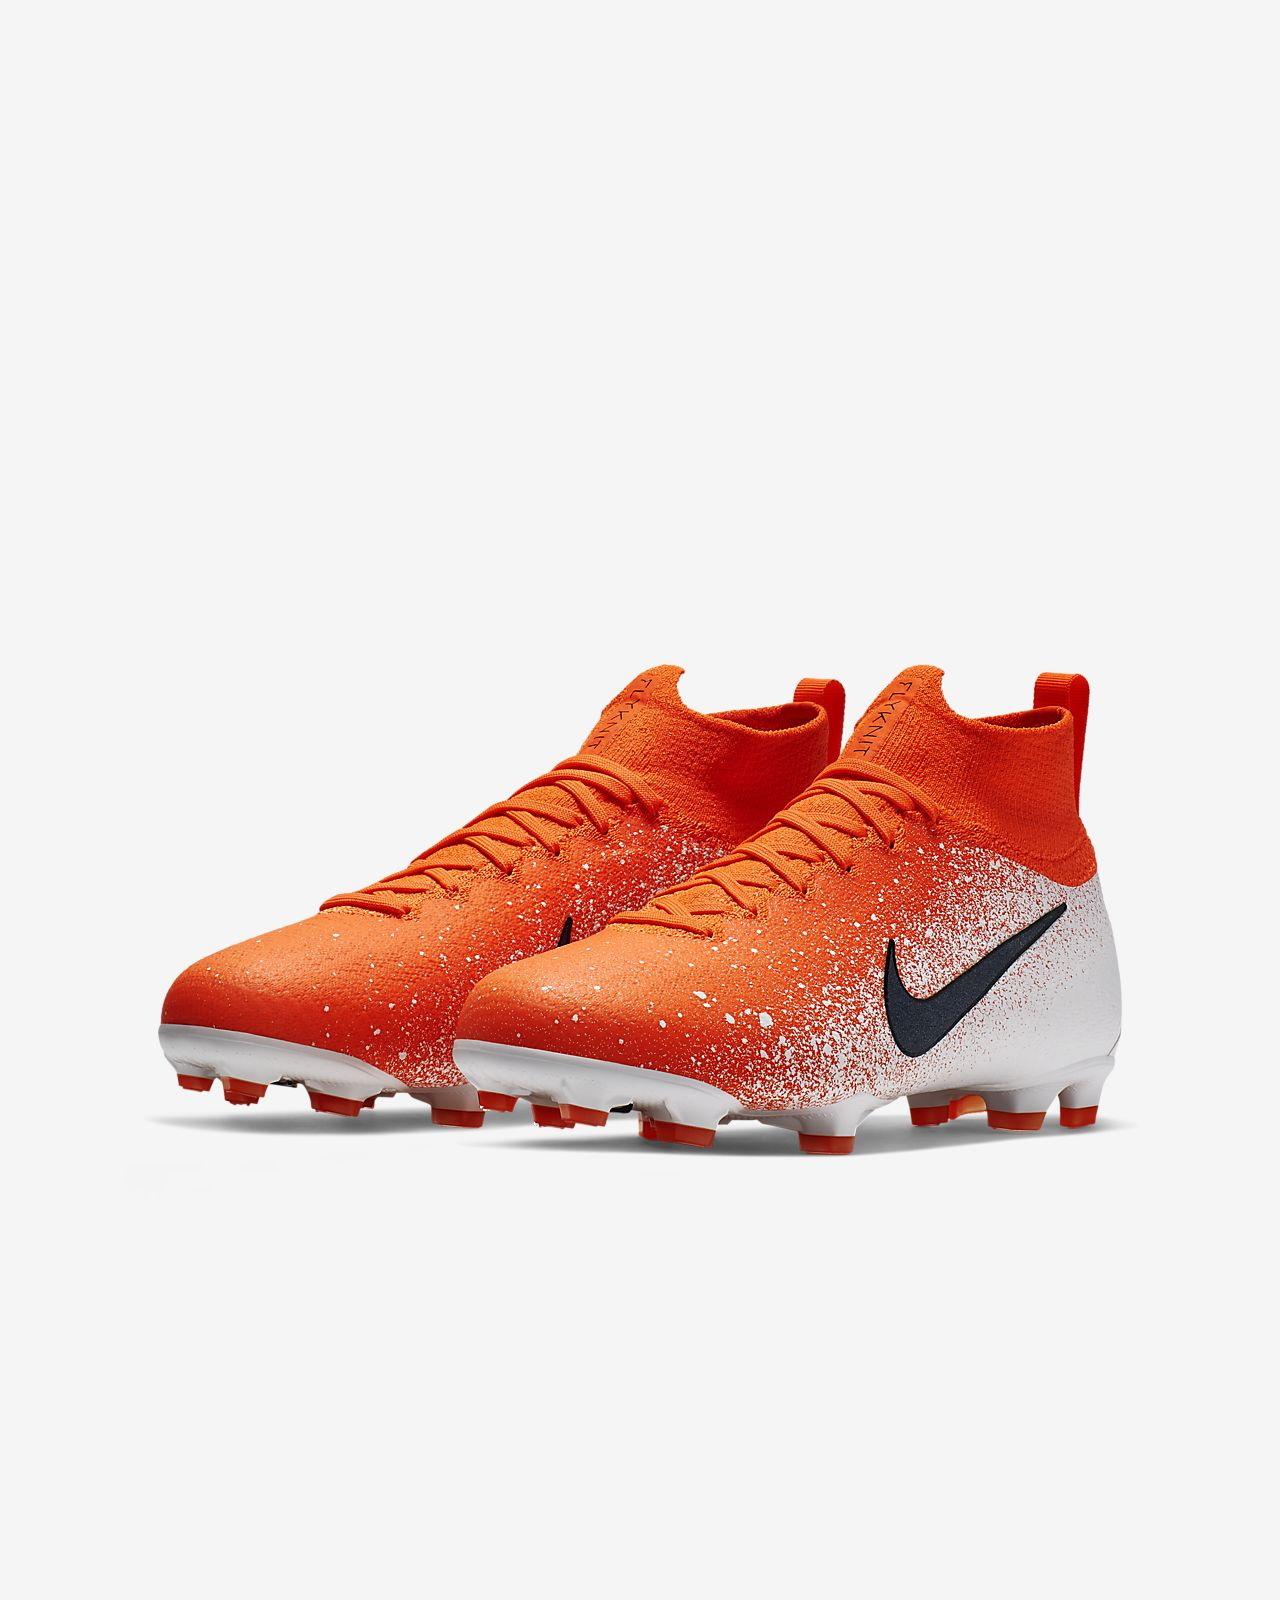 3973ff332 ... Nike Jr. Superfly 6 Elite FG Older Kids' Firm-Ground Football Boot